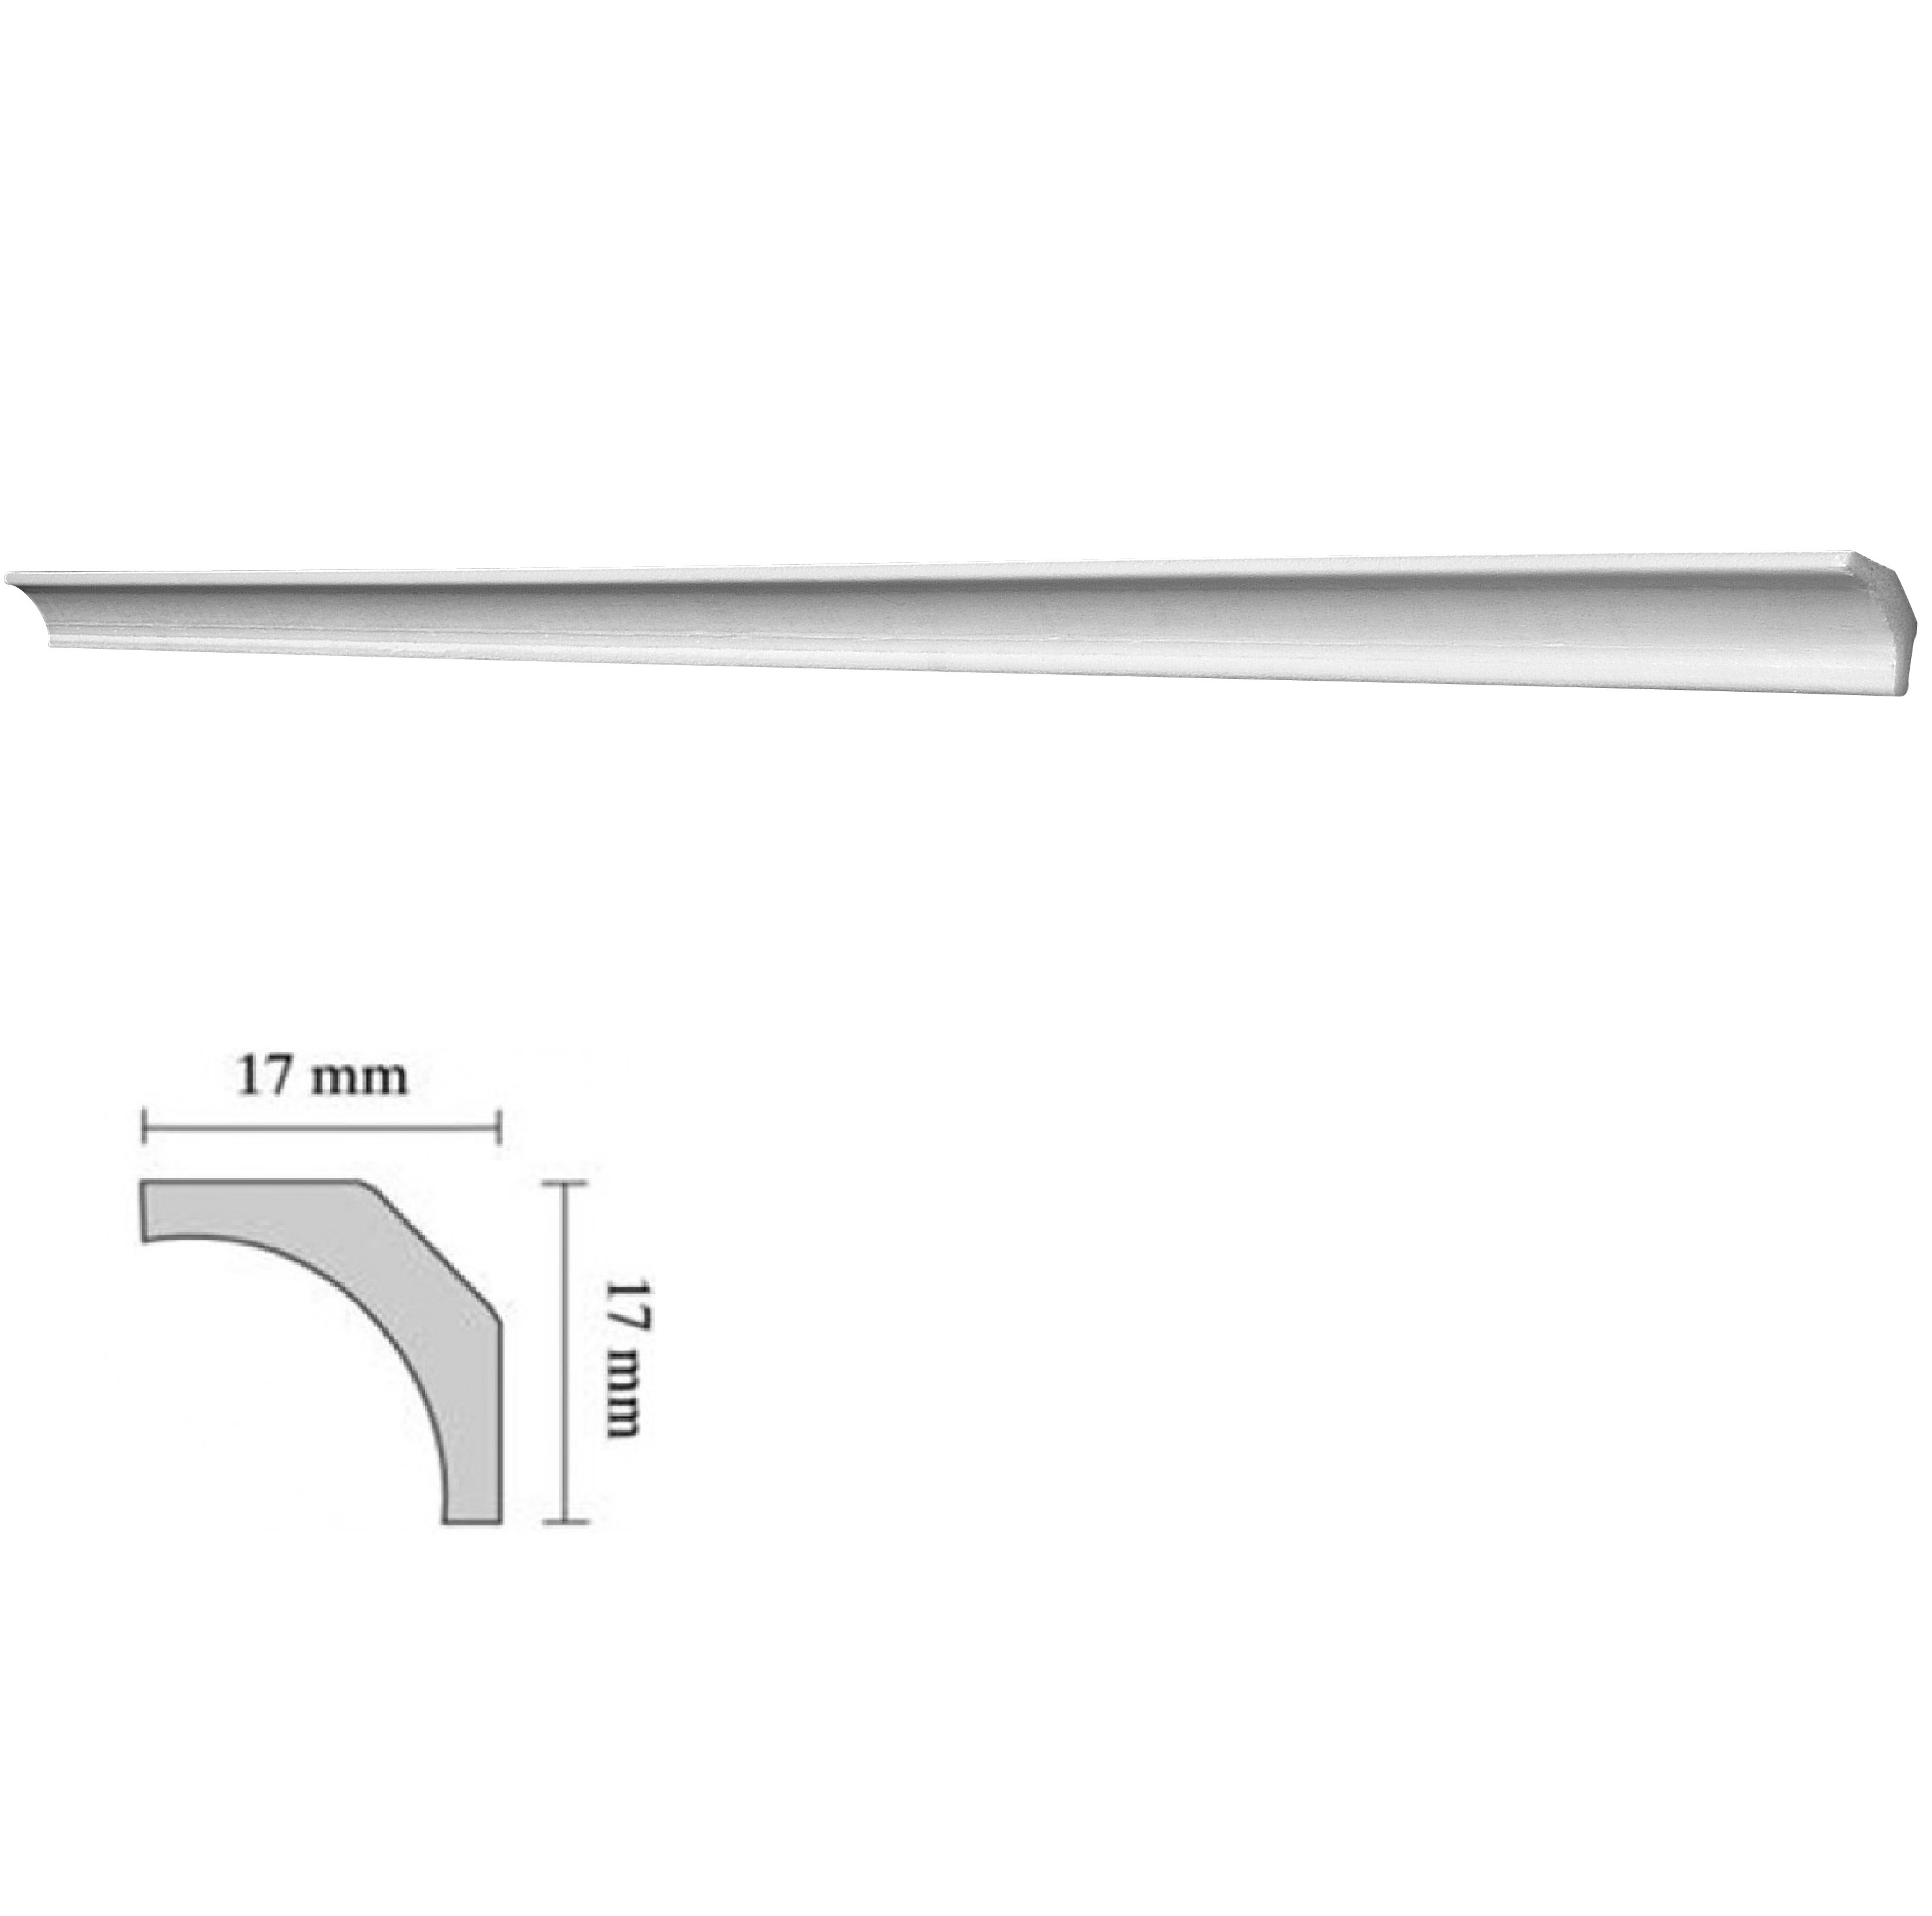 Baghete decorative Decosa- PWX 04 (17x17mm)x350buc cod 13054 davopro 2021